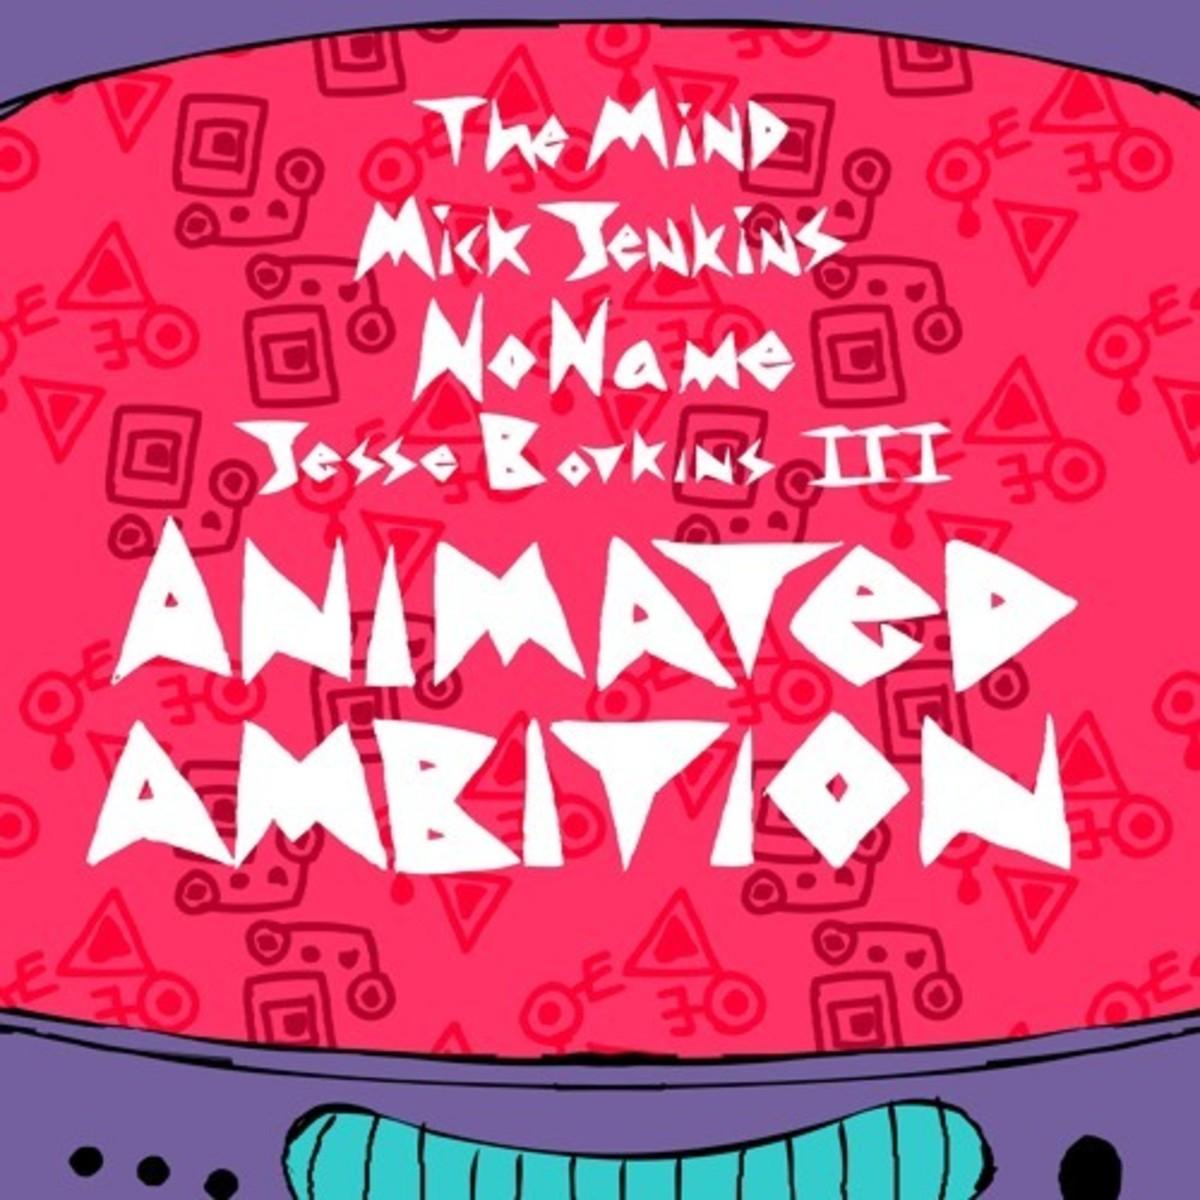 themind-animated-ambition.jpg